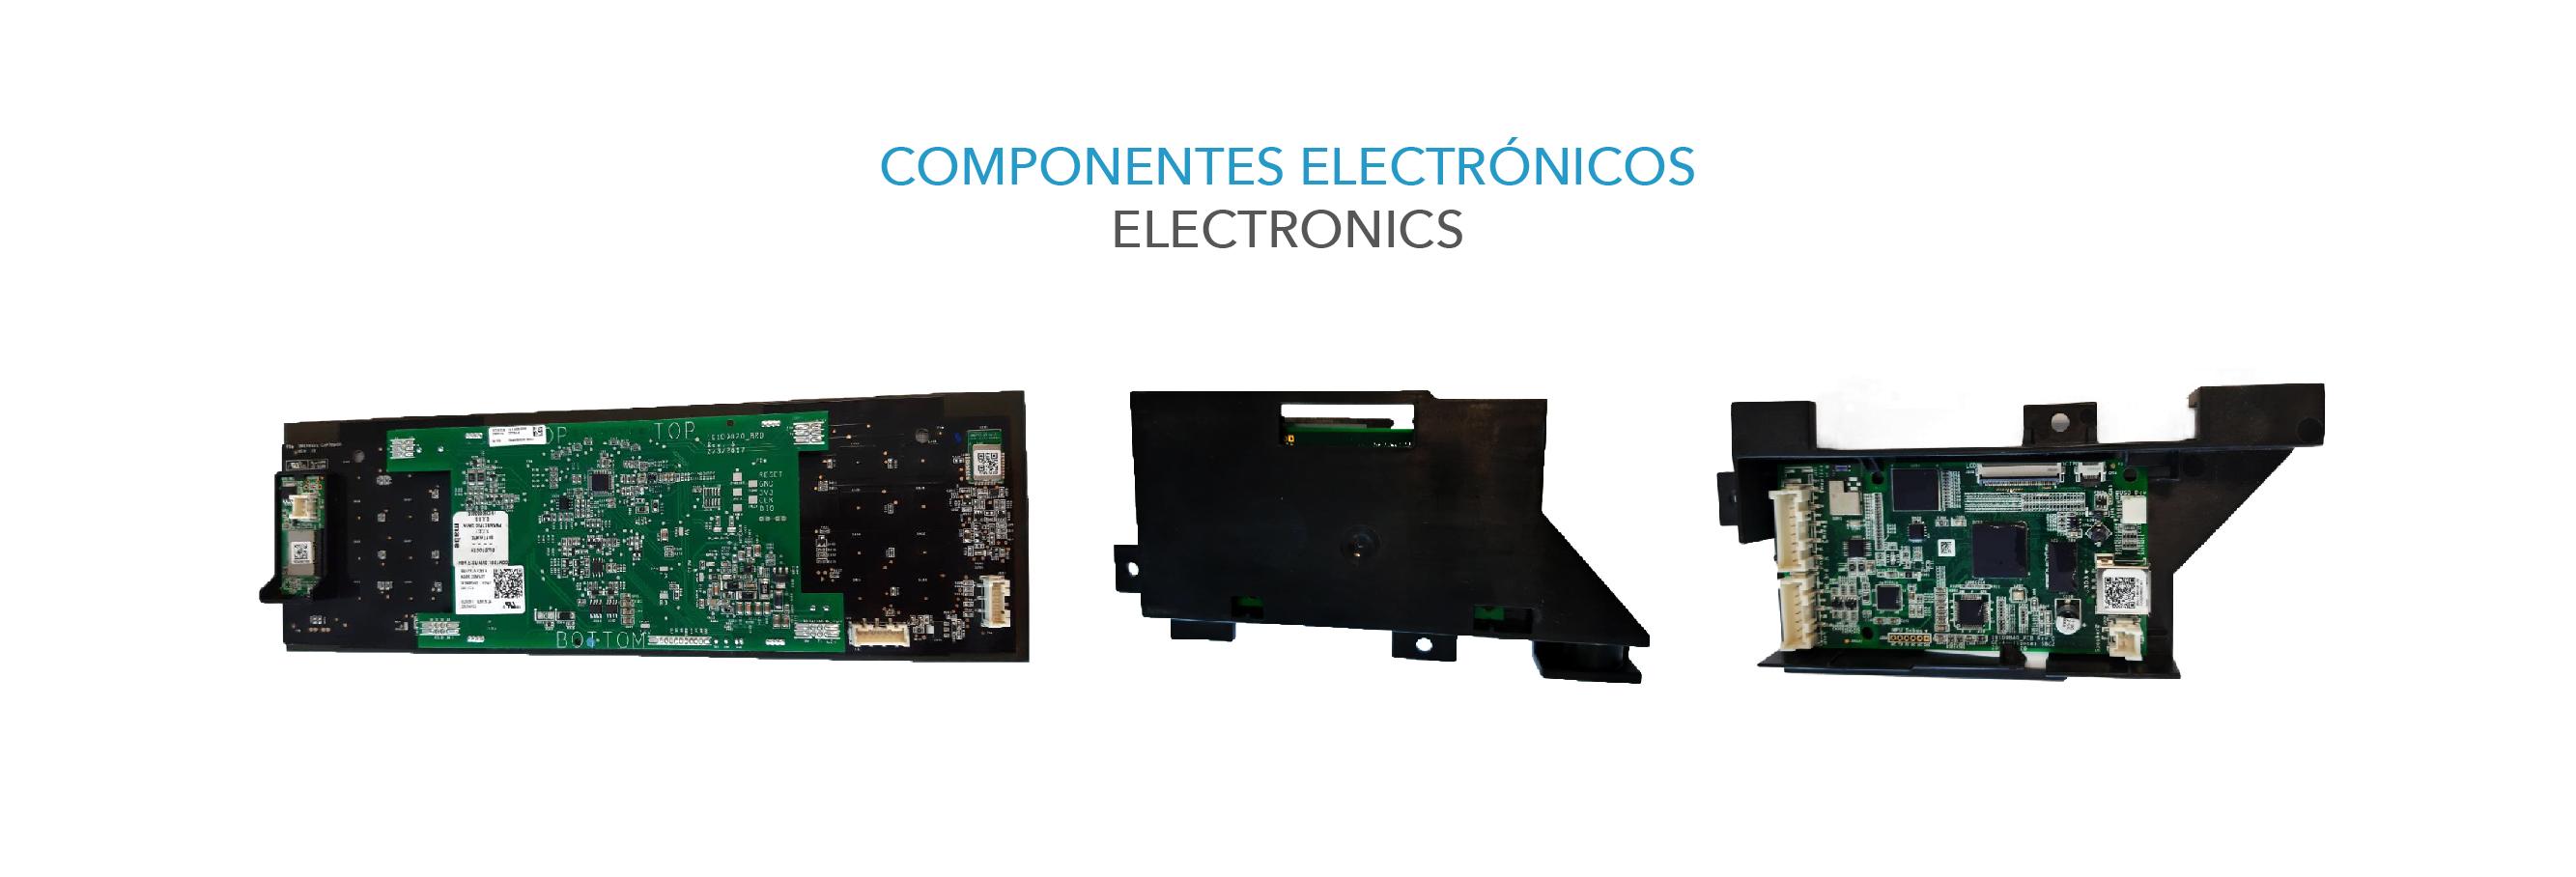 https://0201.nccdn.net/4_2/000/000/060/85f/piezas_mesa-de-trabajo-1.jpg